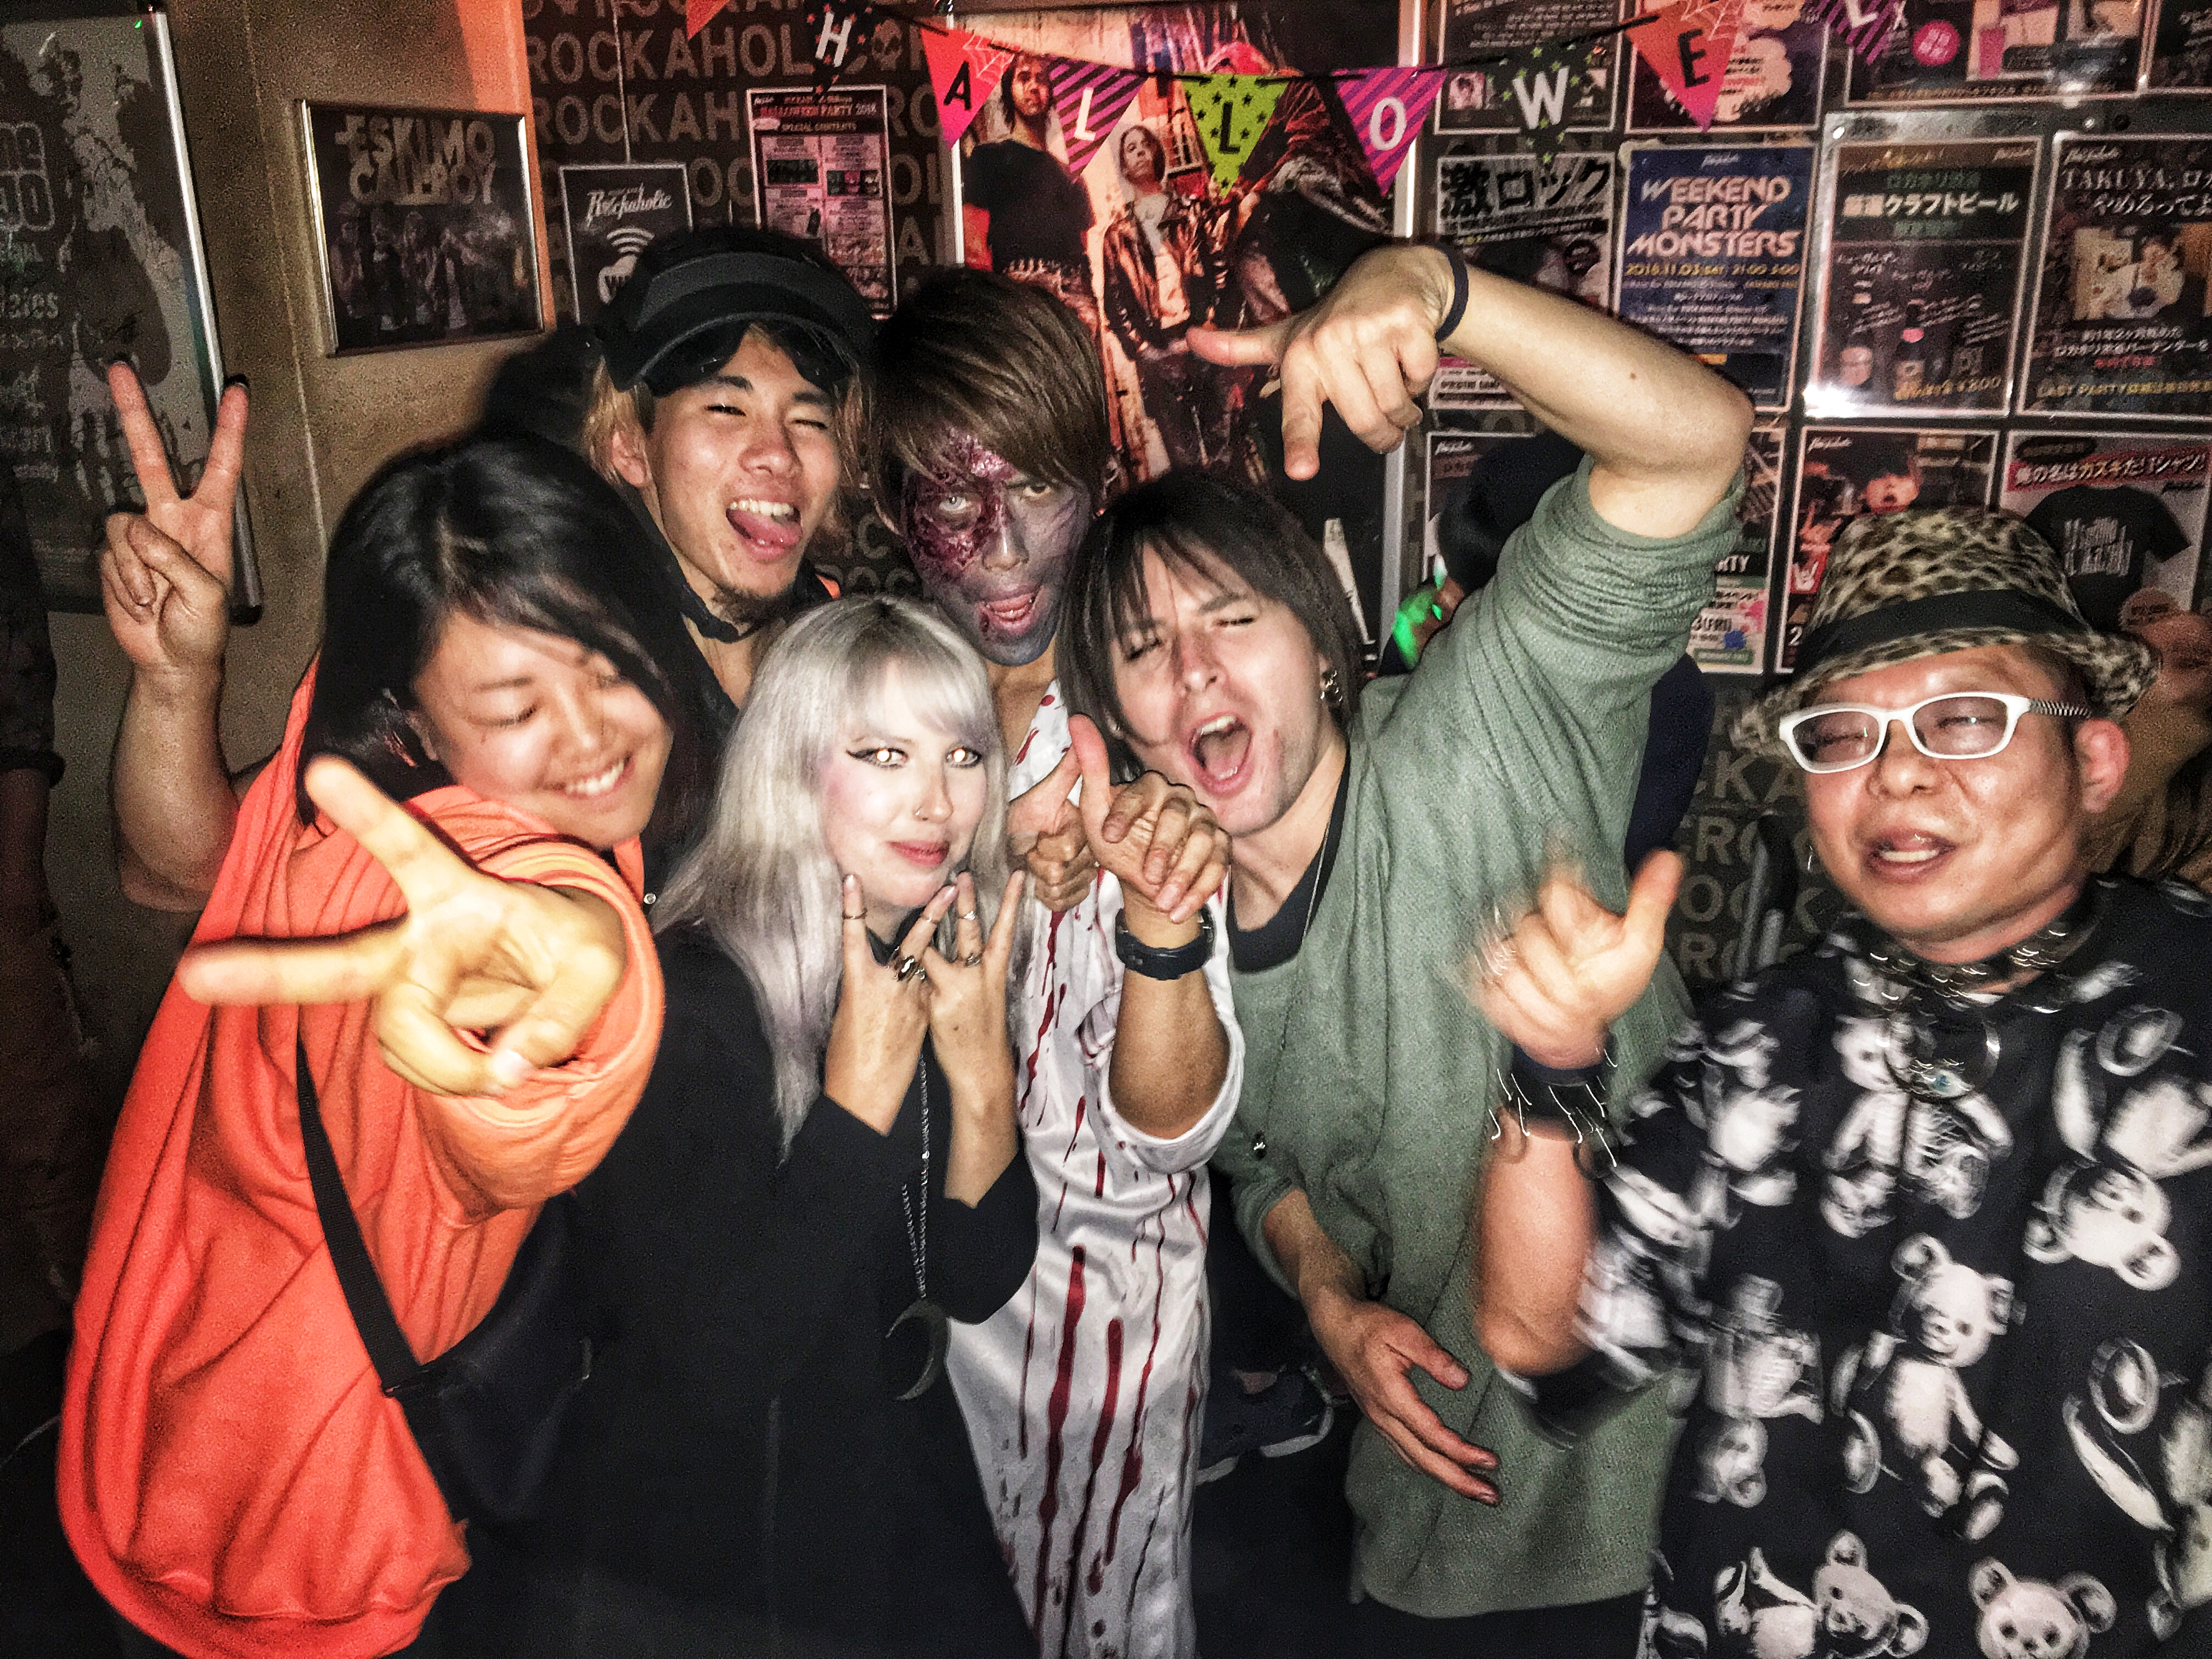 https://bar-rockaholic.jp/shibuya/blog/42D0975B-8EF2-4DAC-A926-E25A20015E1E.jpeg